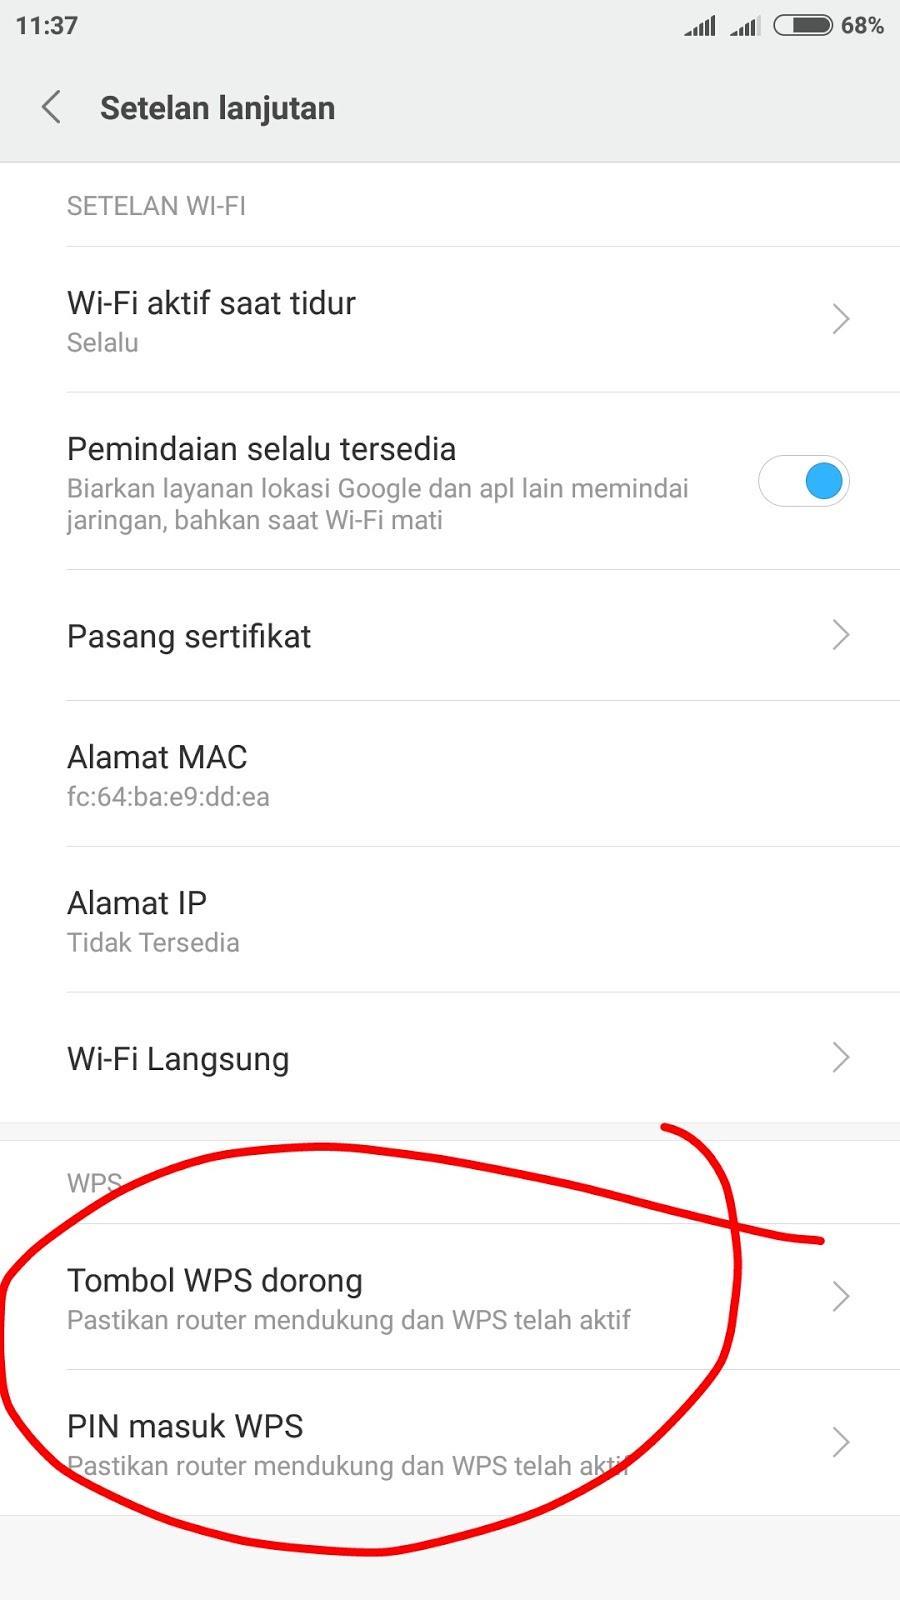 Ini Rahasia Android Bisa Tembus Wpa Wps Password Wifi Tanpa Root